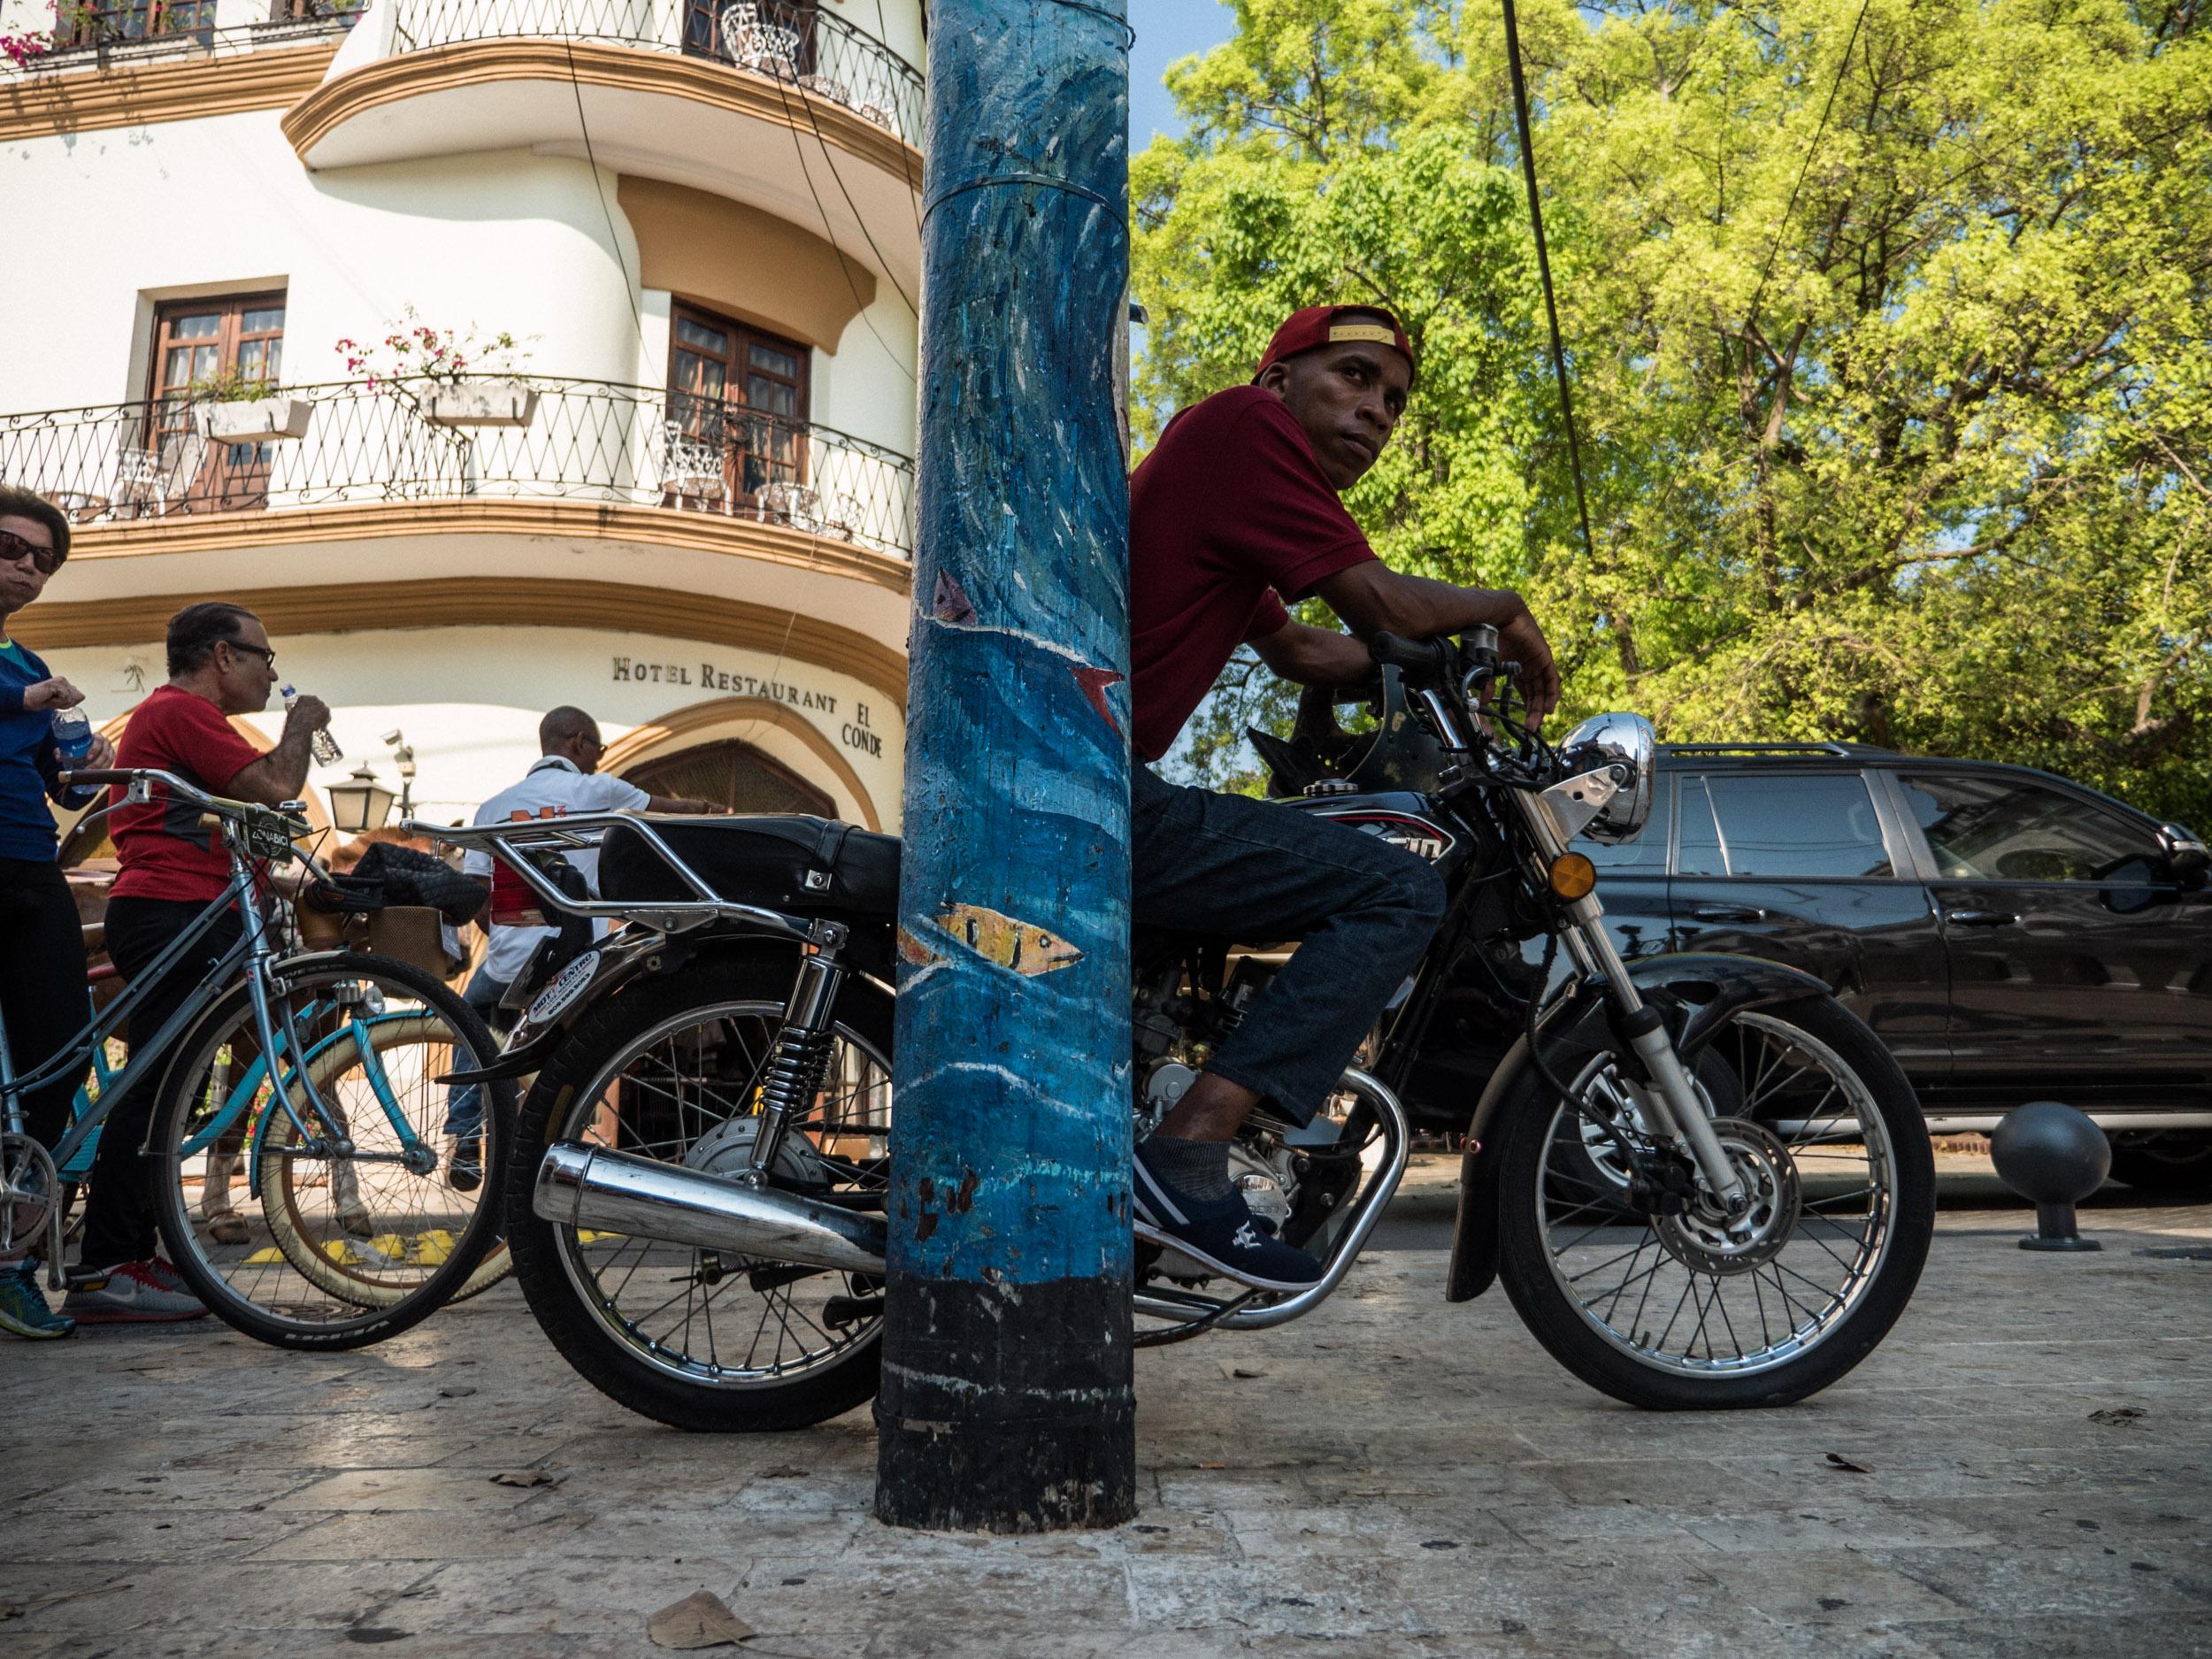 _32 Man resting on Bike Santo Domingo .jpg